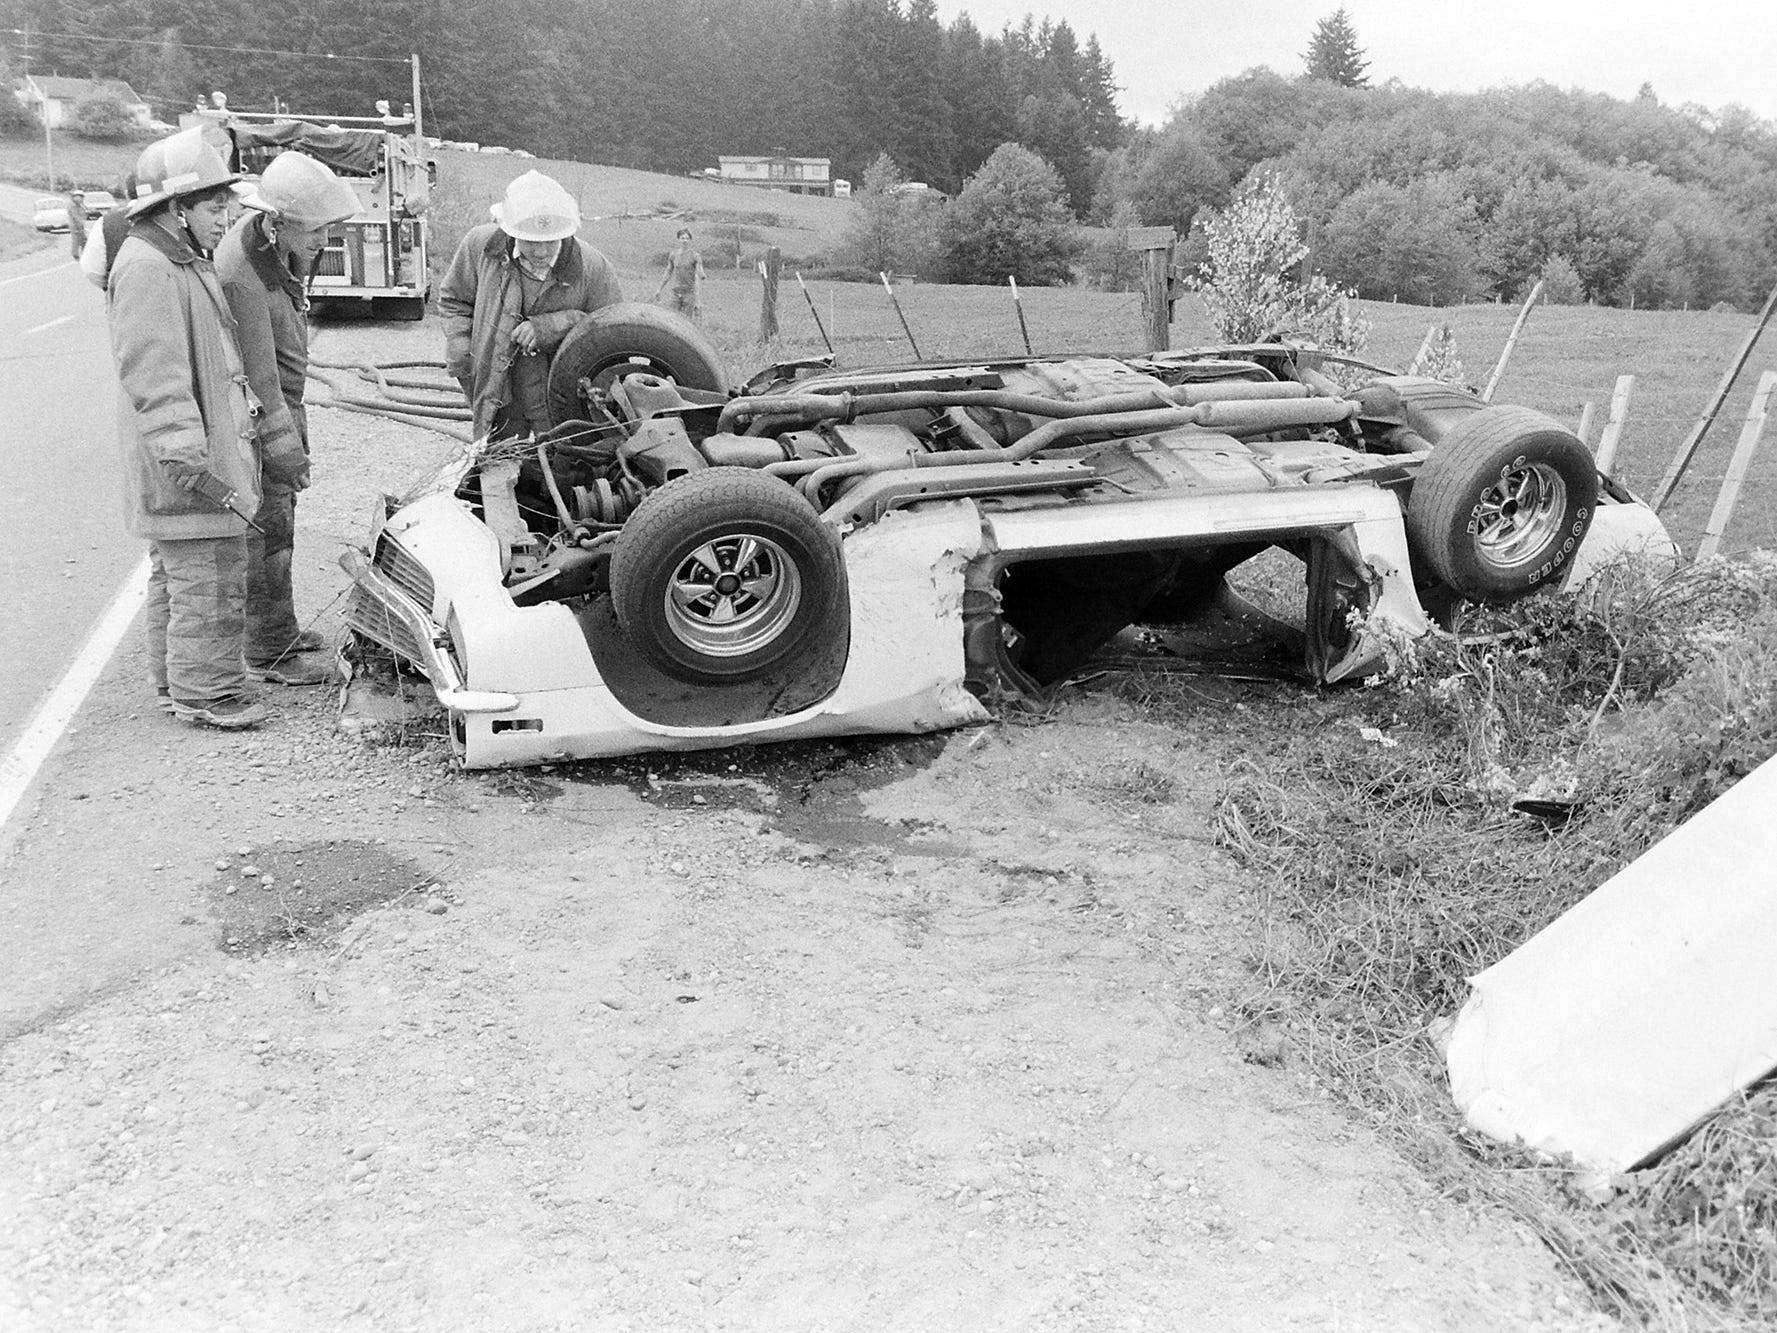 05/26/88Drag Racing Rollover